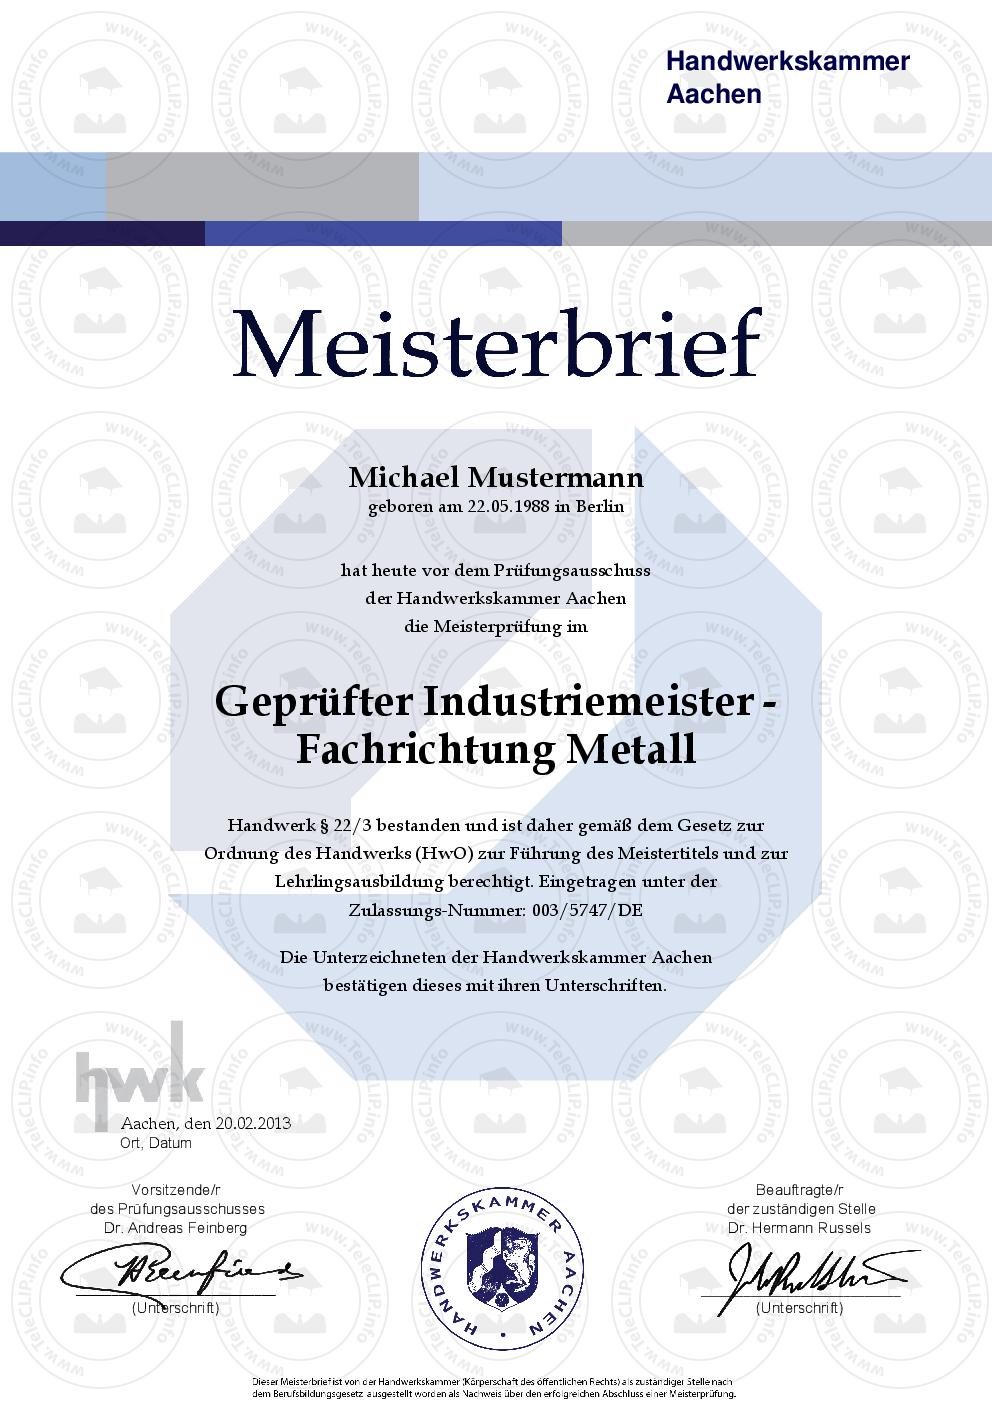 hwk_meisterbrief_5